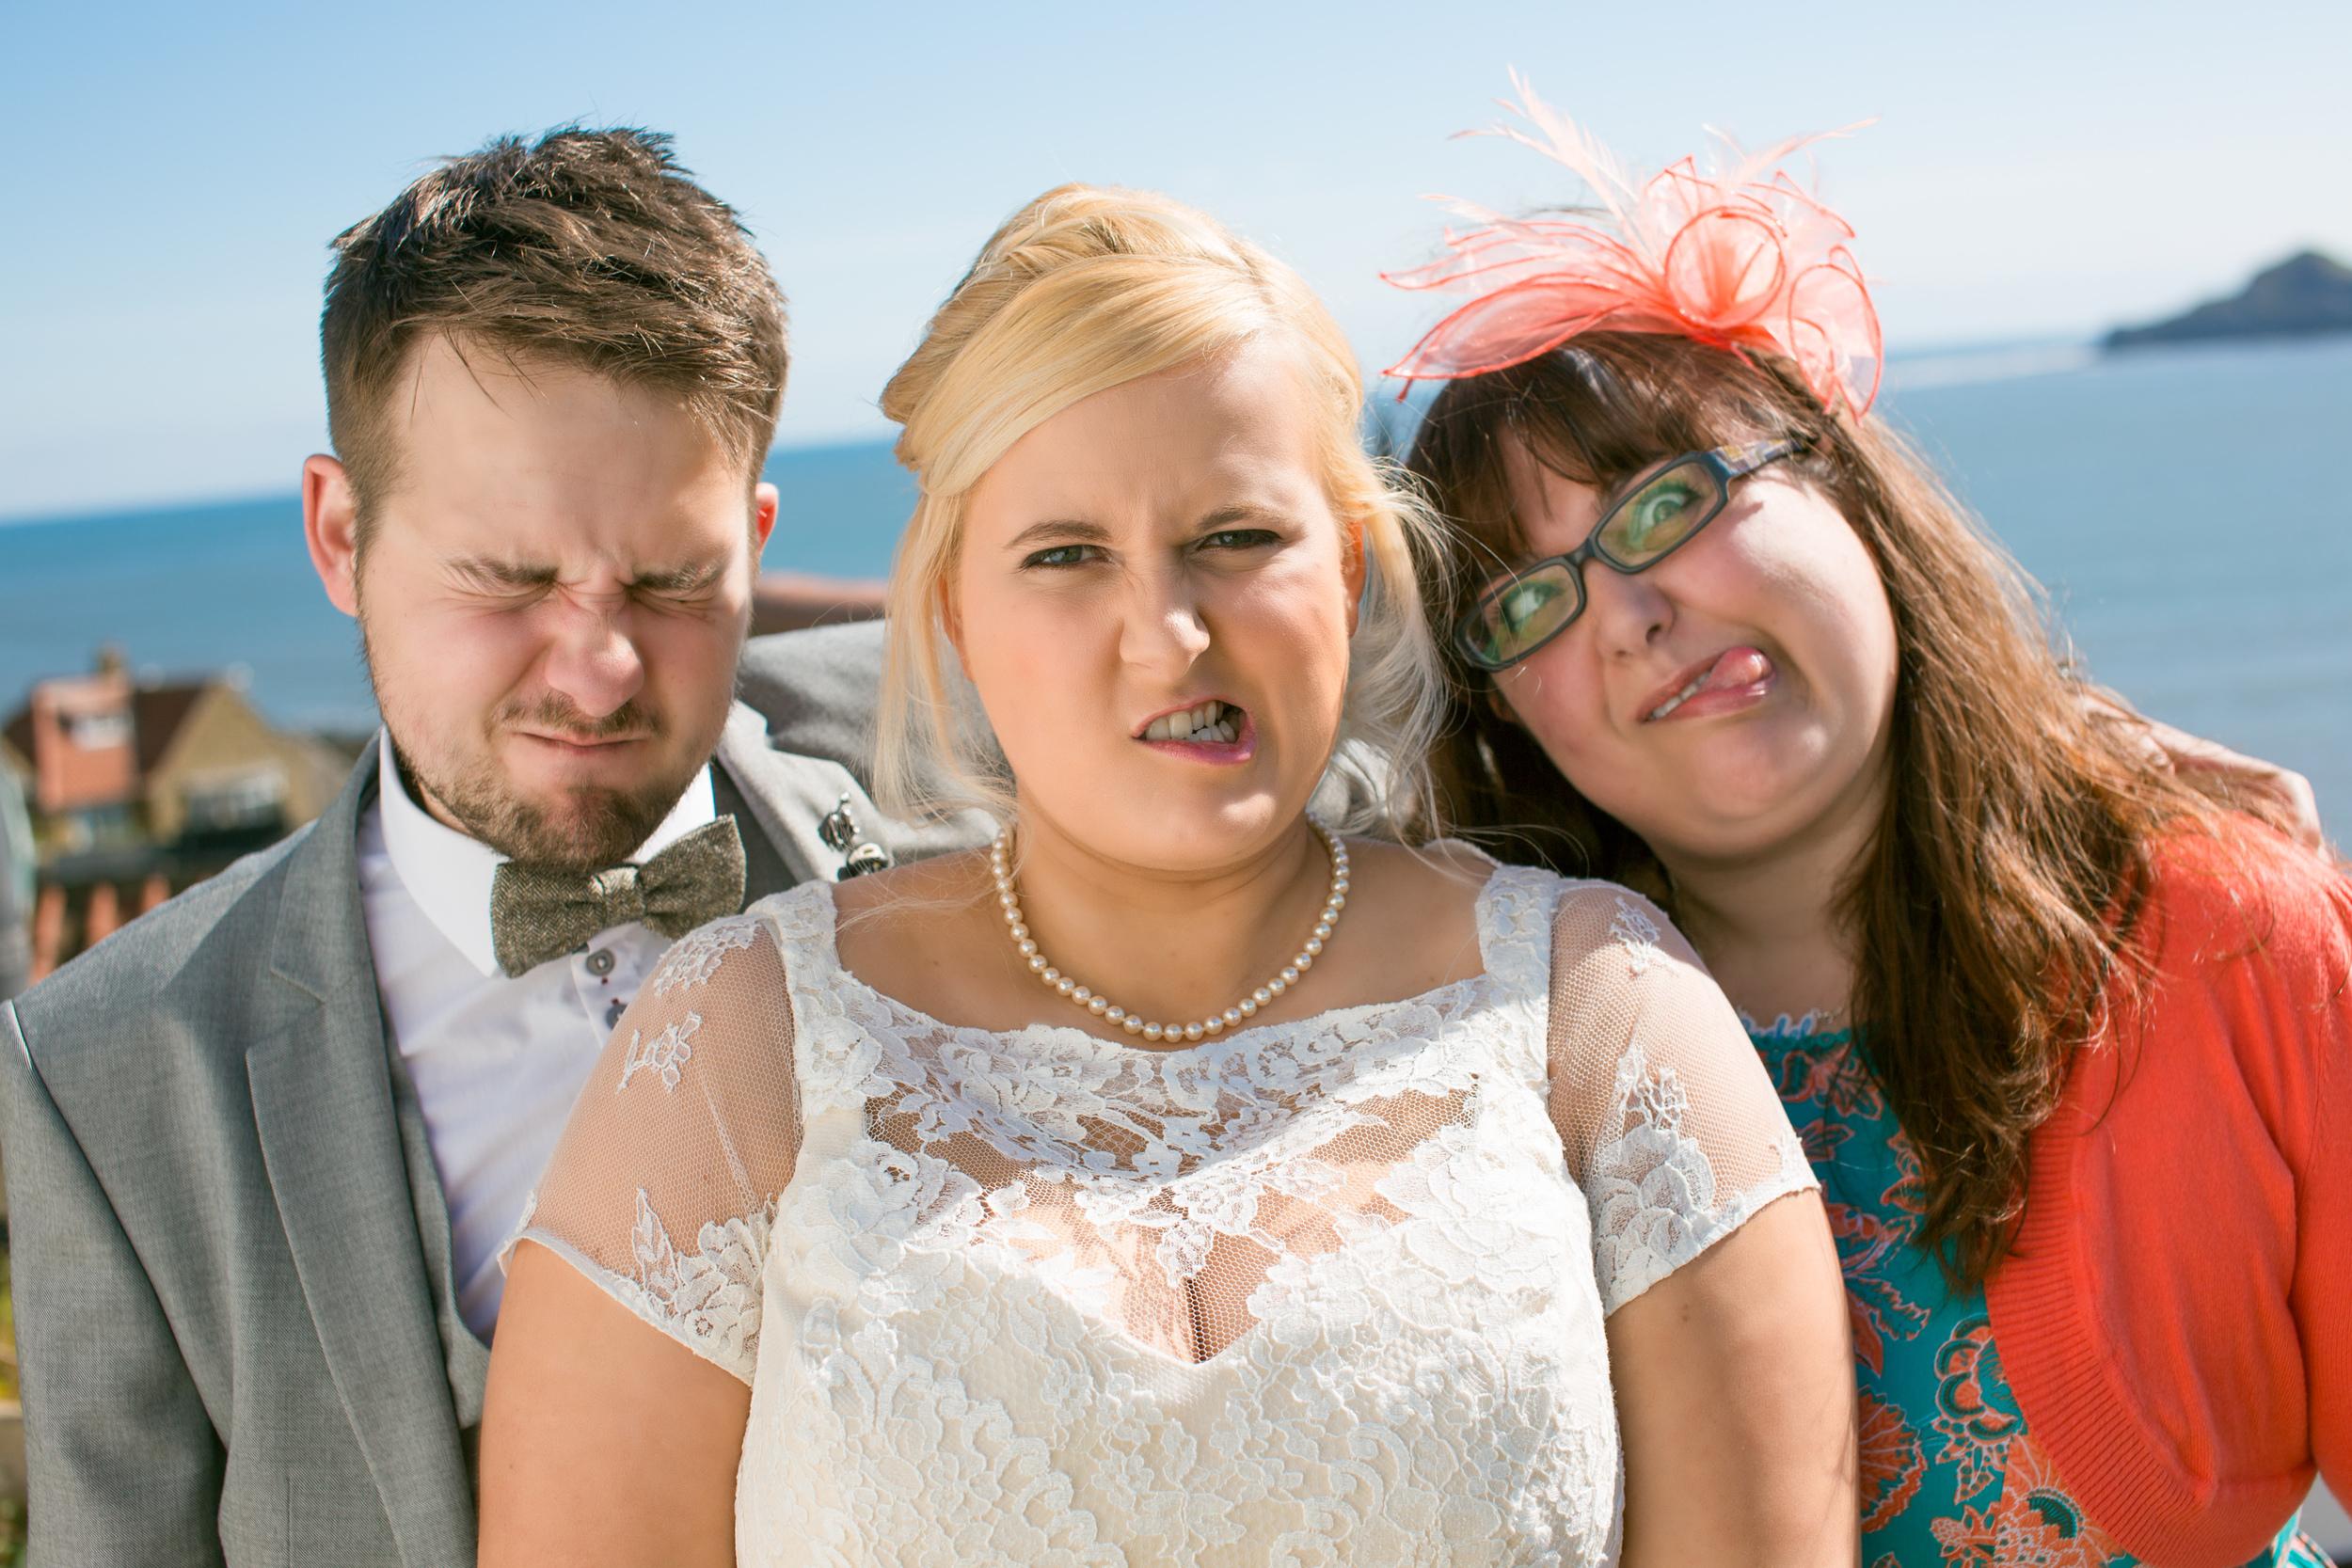 Yorkshire Wedding Photography - Anna & Alex at Runswick Bay